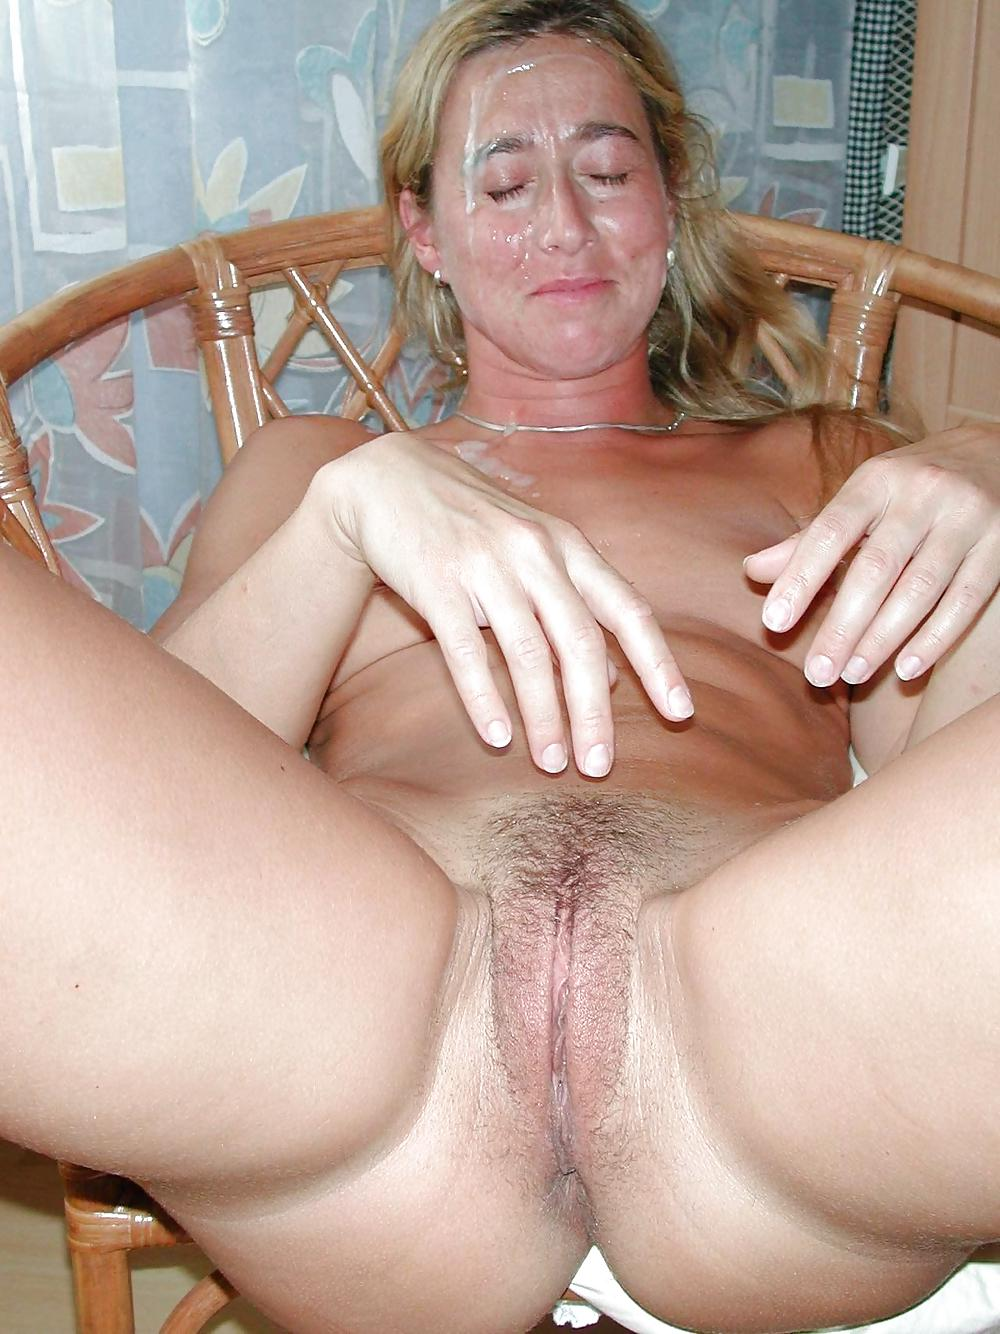 Lesbian milf moms